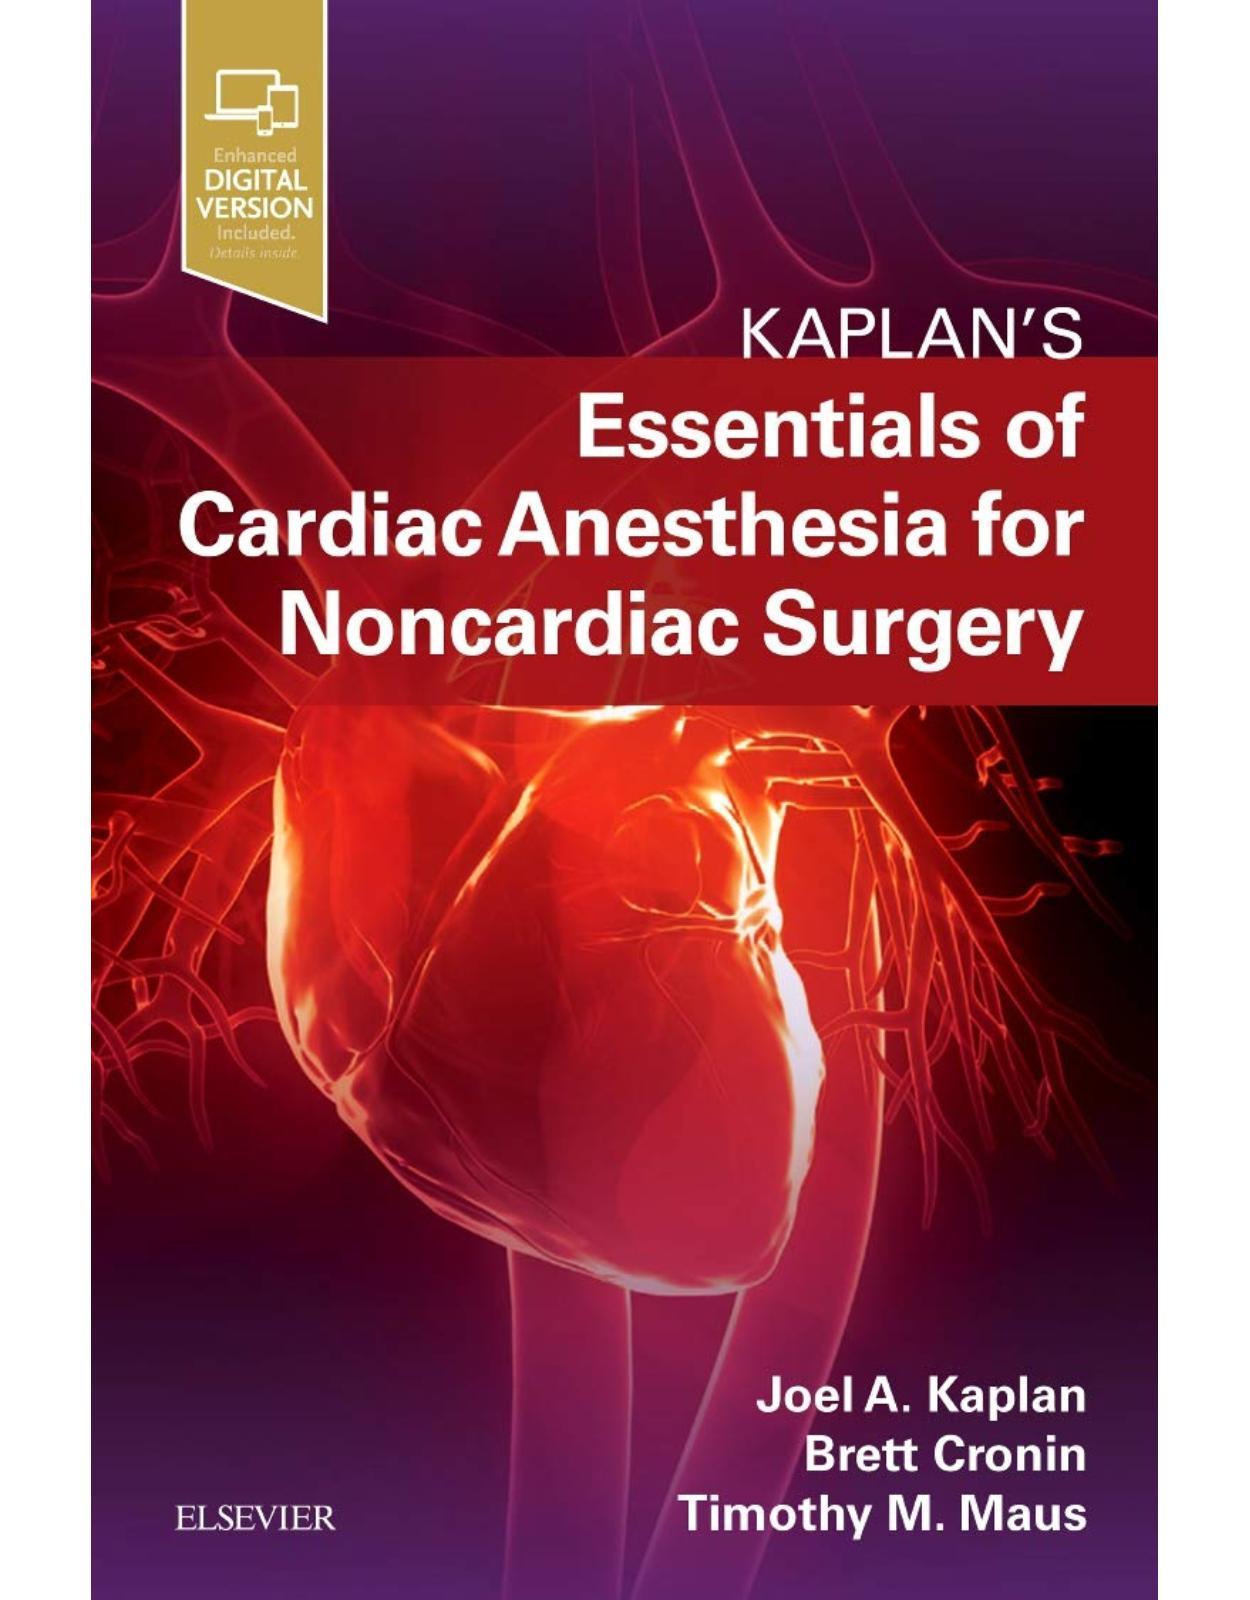 Essentials of Cardiac Anesthesia for Noncardiac Surgery: A Companion to Kaplan's Cardiac Anesthesia